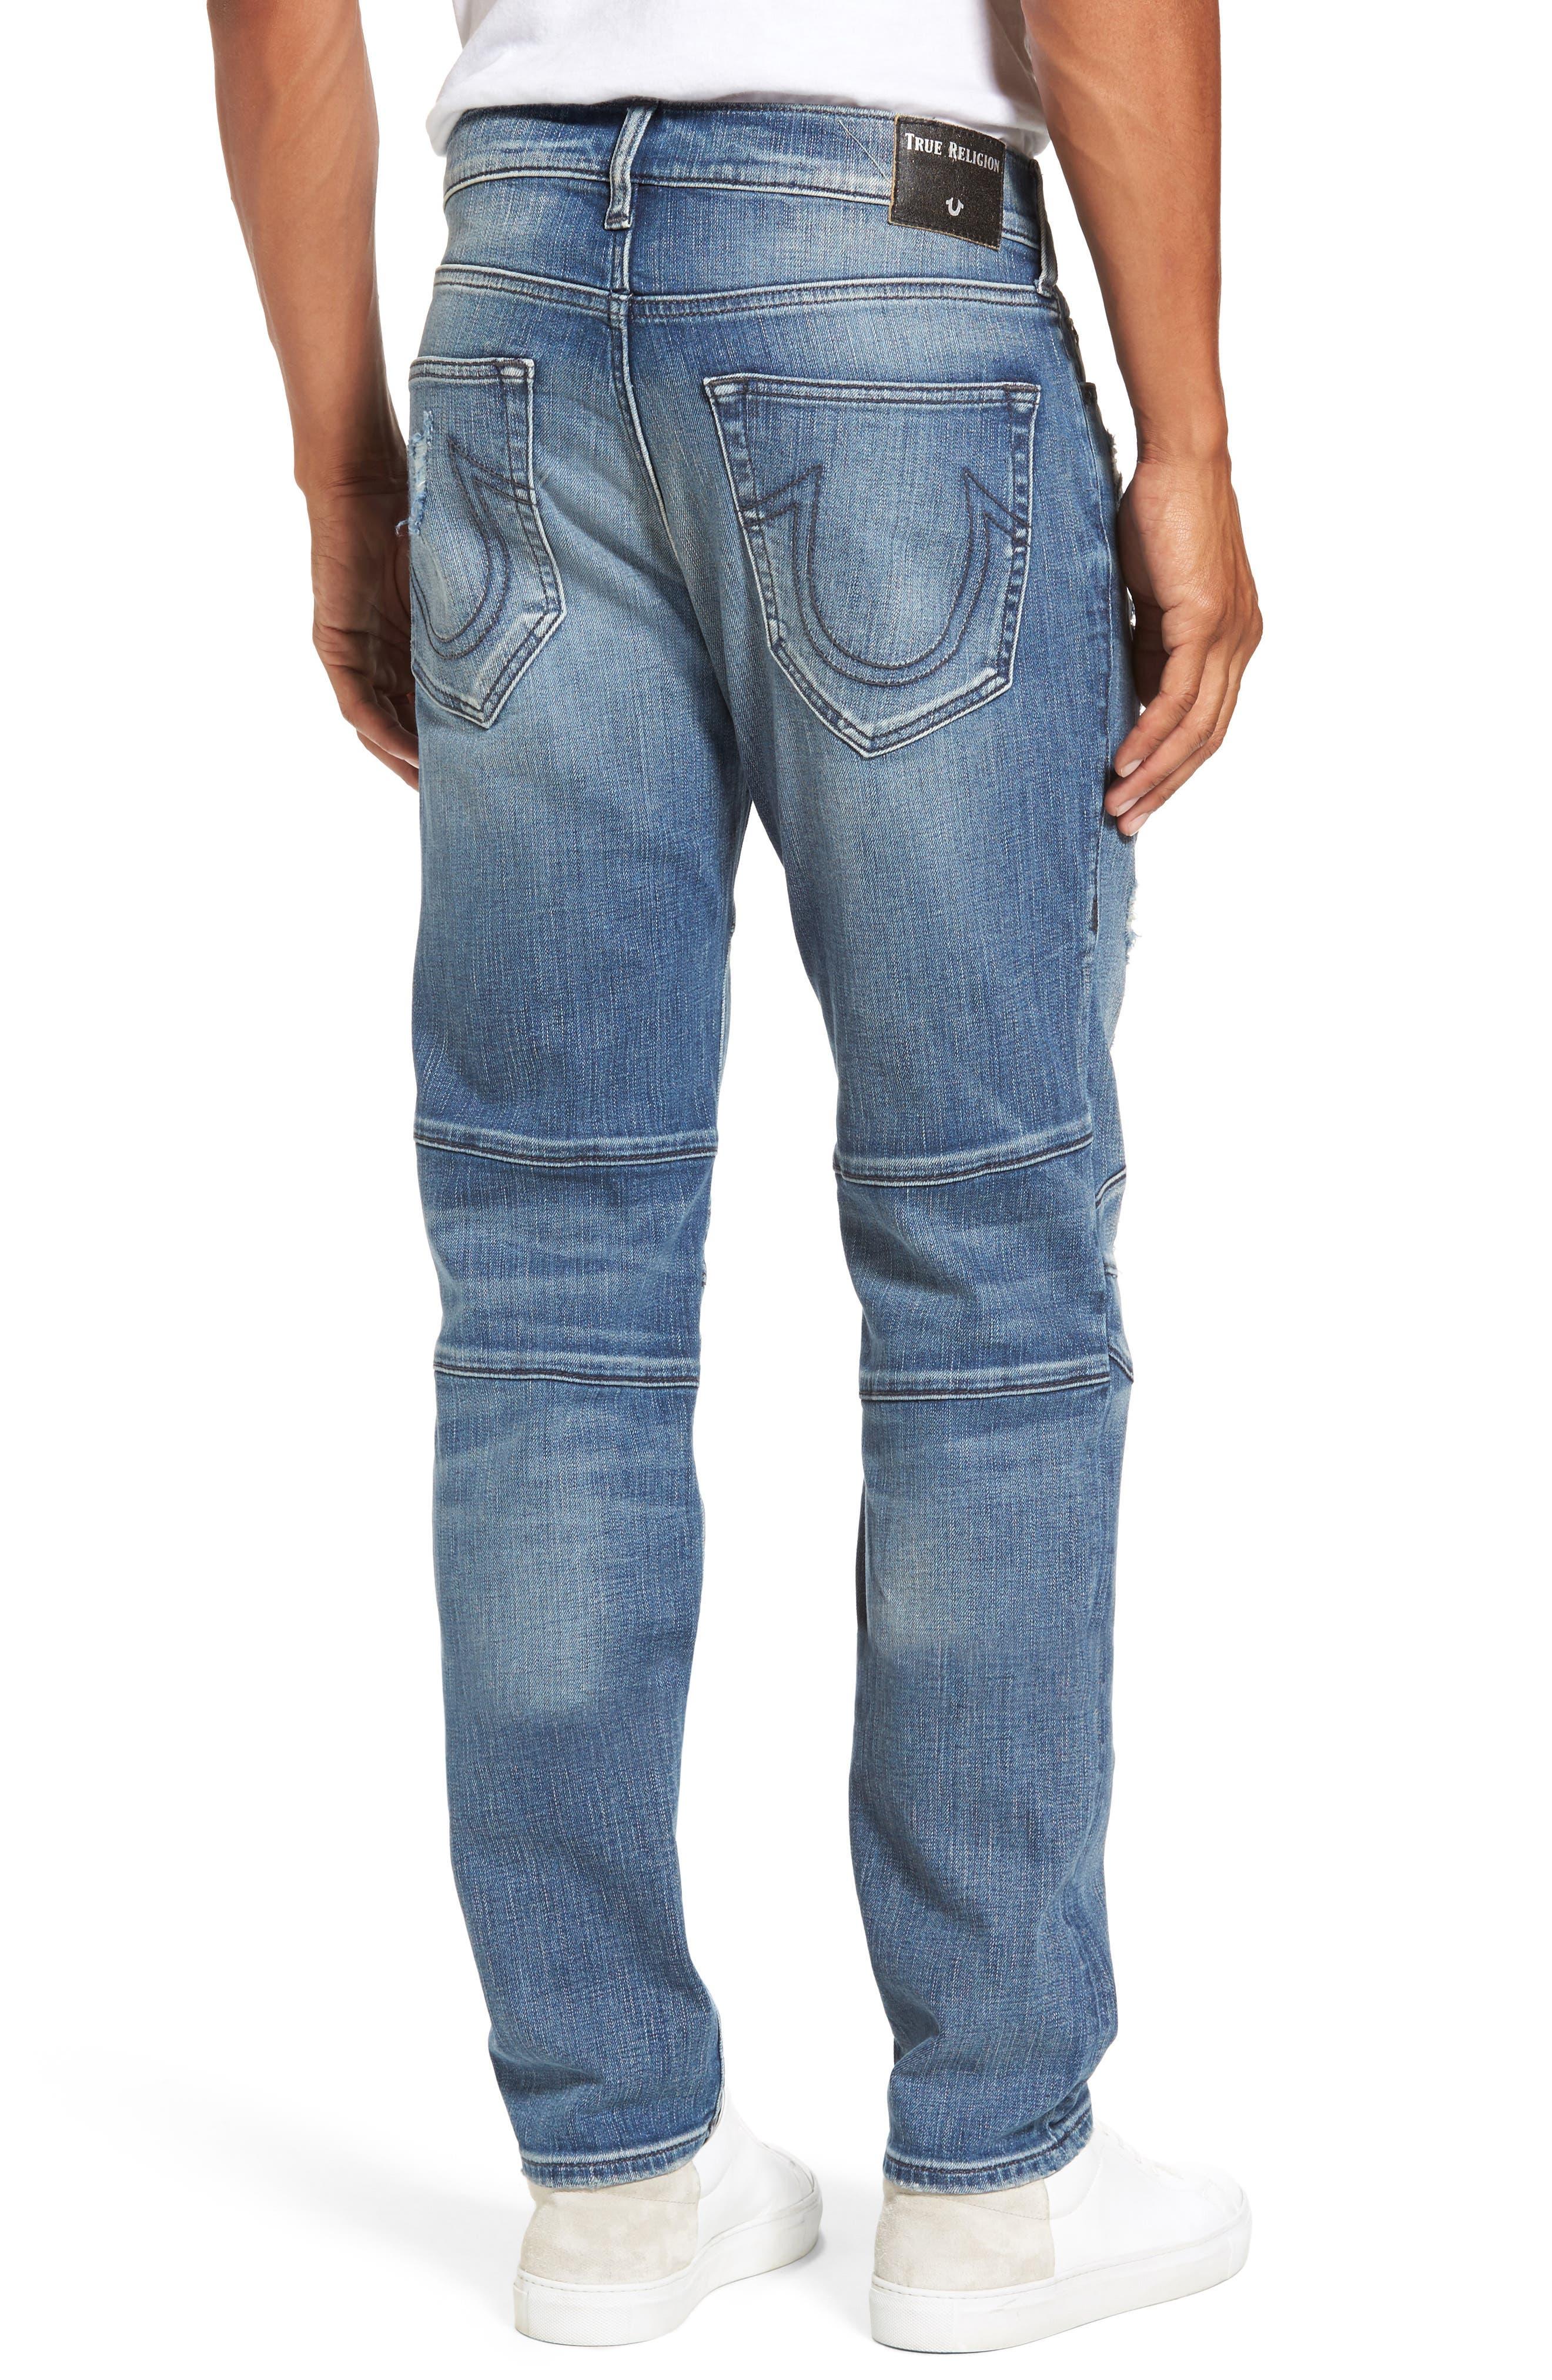 Alternate Image 2  - True Religion Brand Jeans Rocco Skinny Fit Jeans (Indigo Clutch)